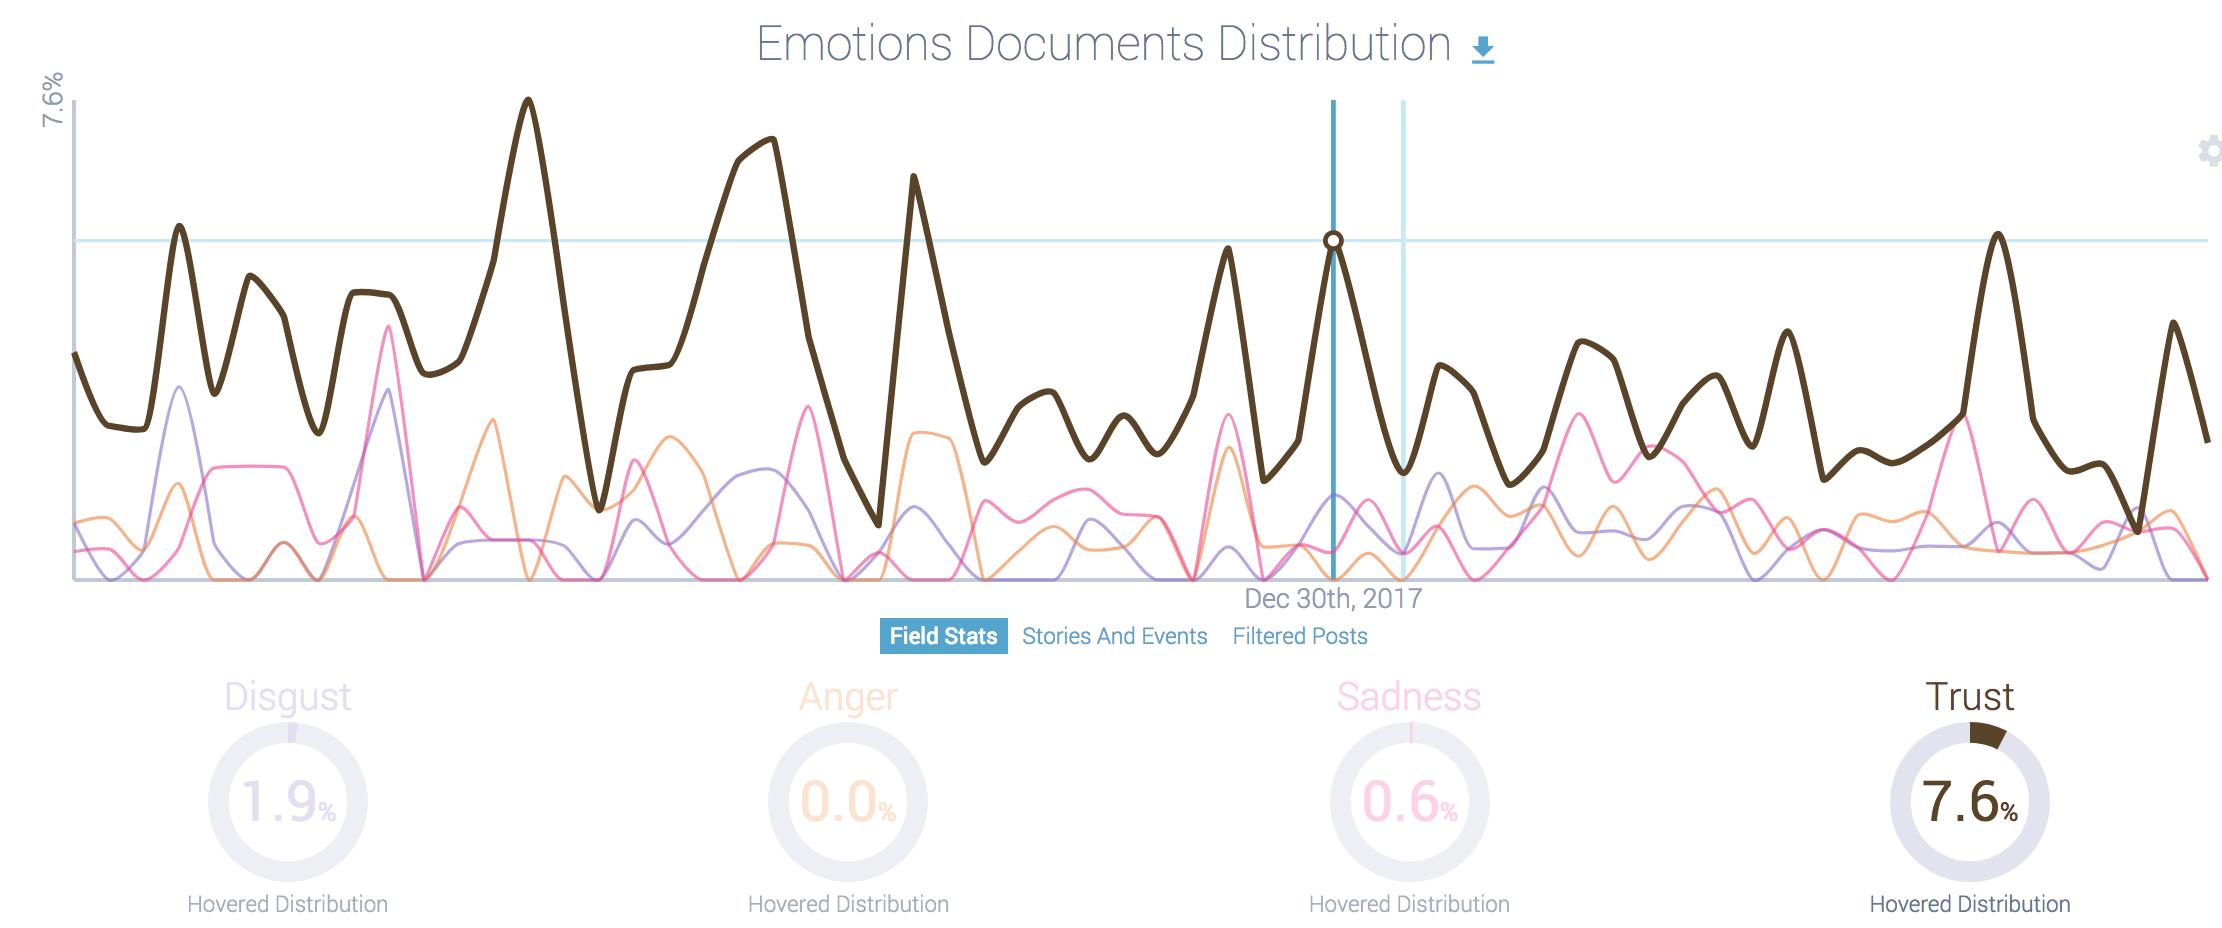 social listening data: trust in gopro